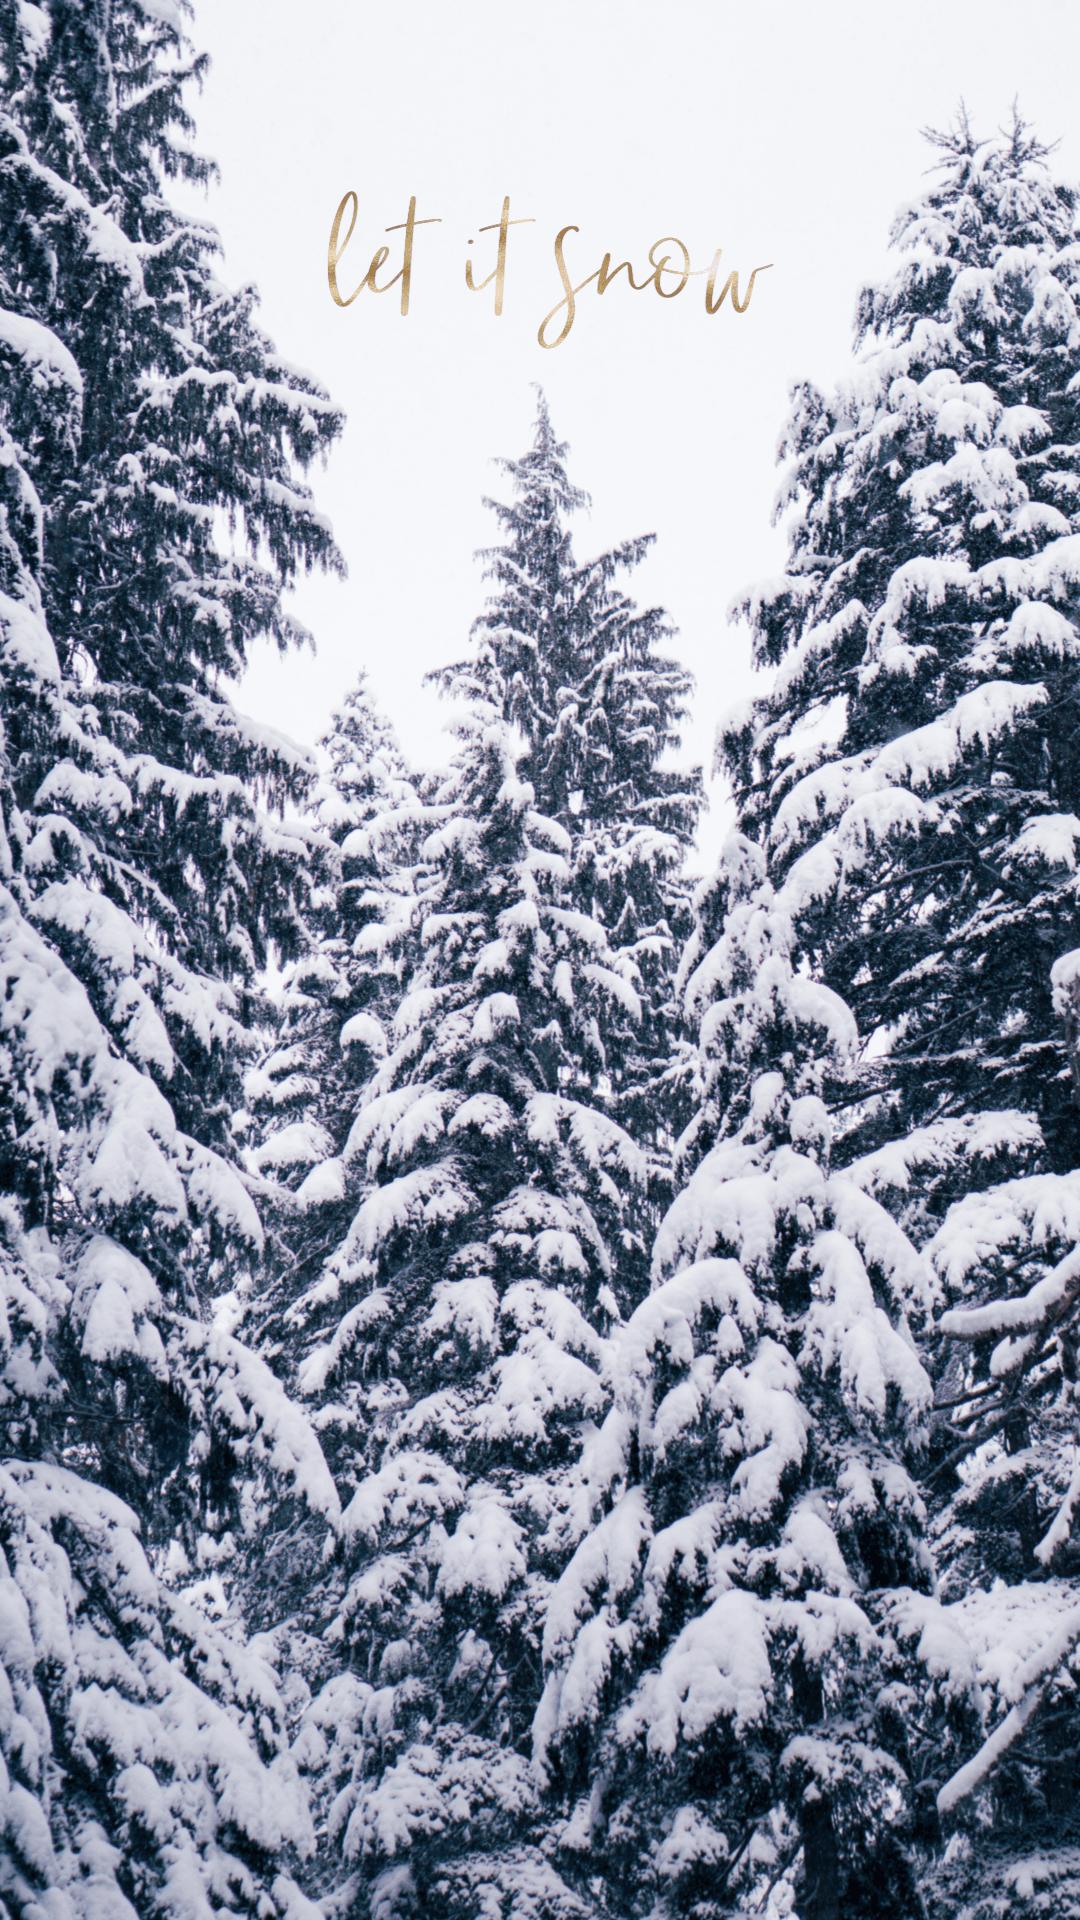 aesthetic winter wallpapers